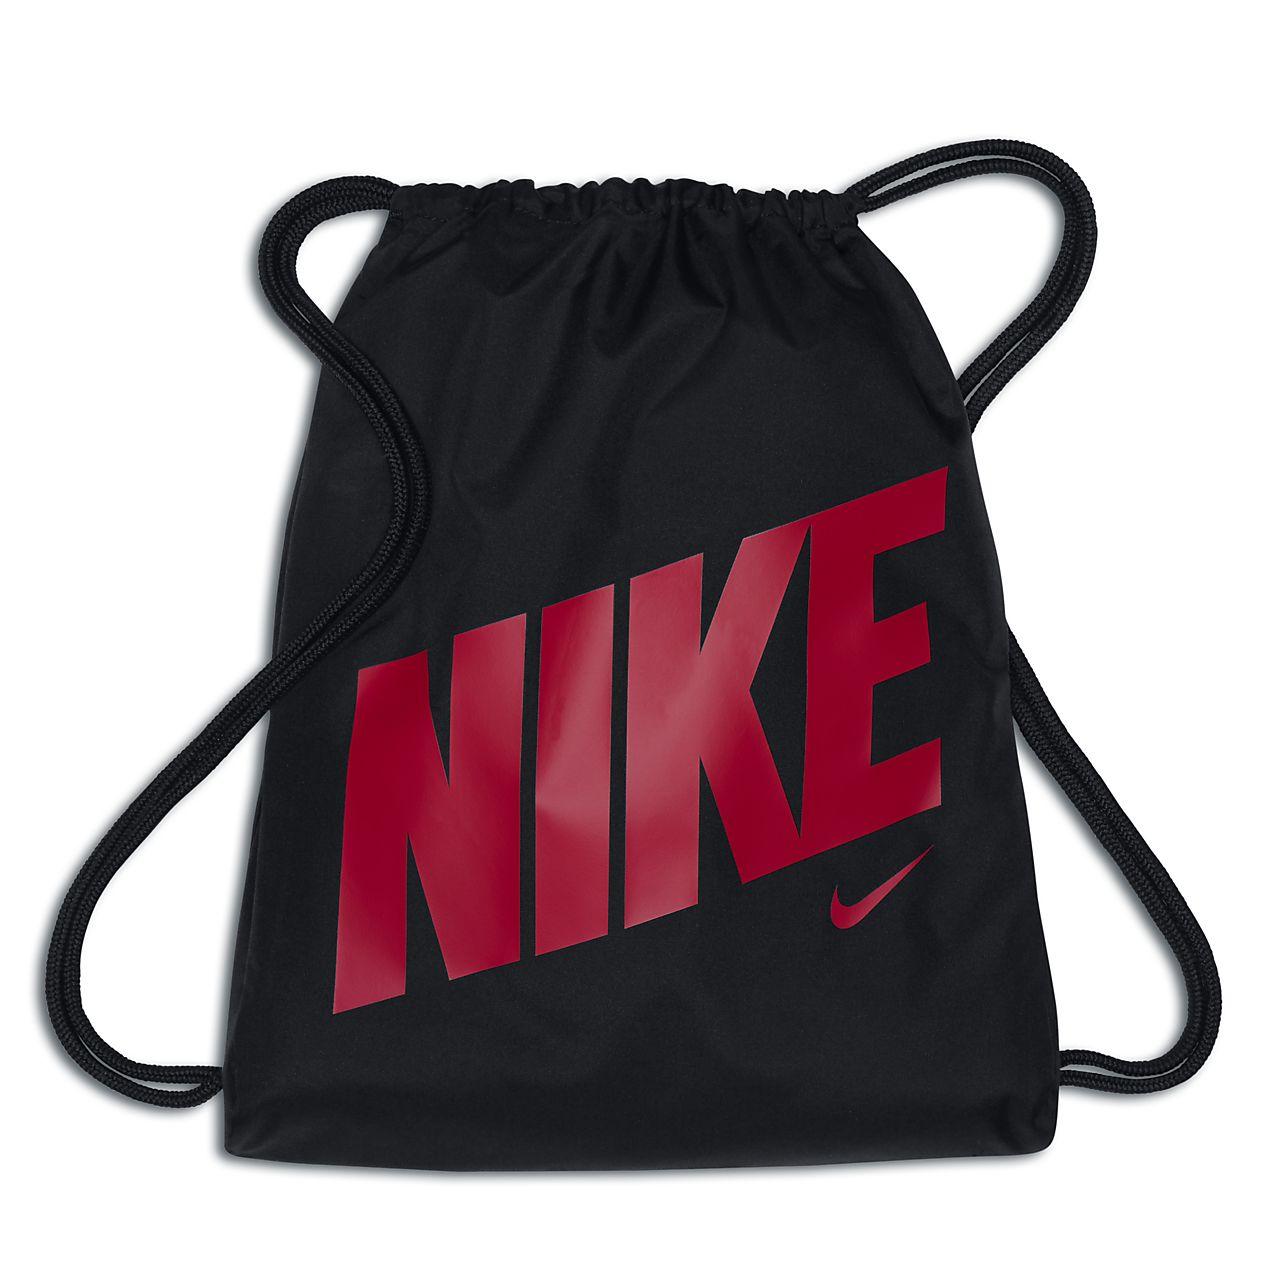 Nike Sac de sport Sportswear Heritage Bag bZA6m1E2